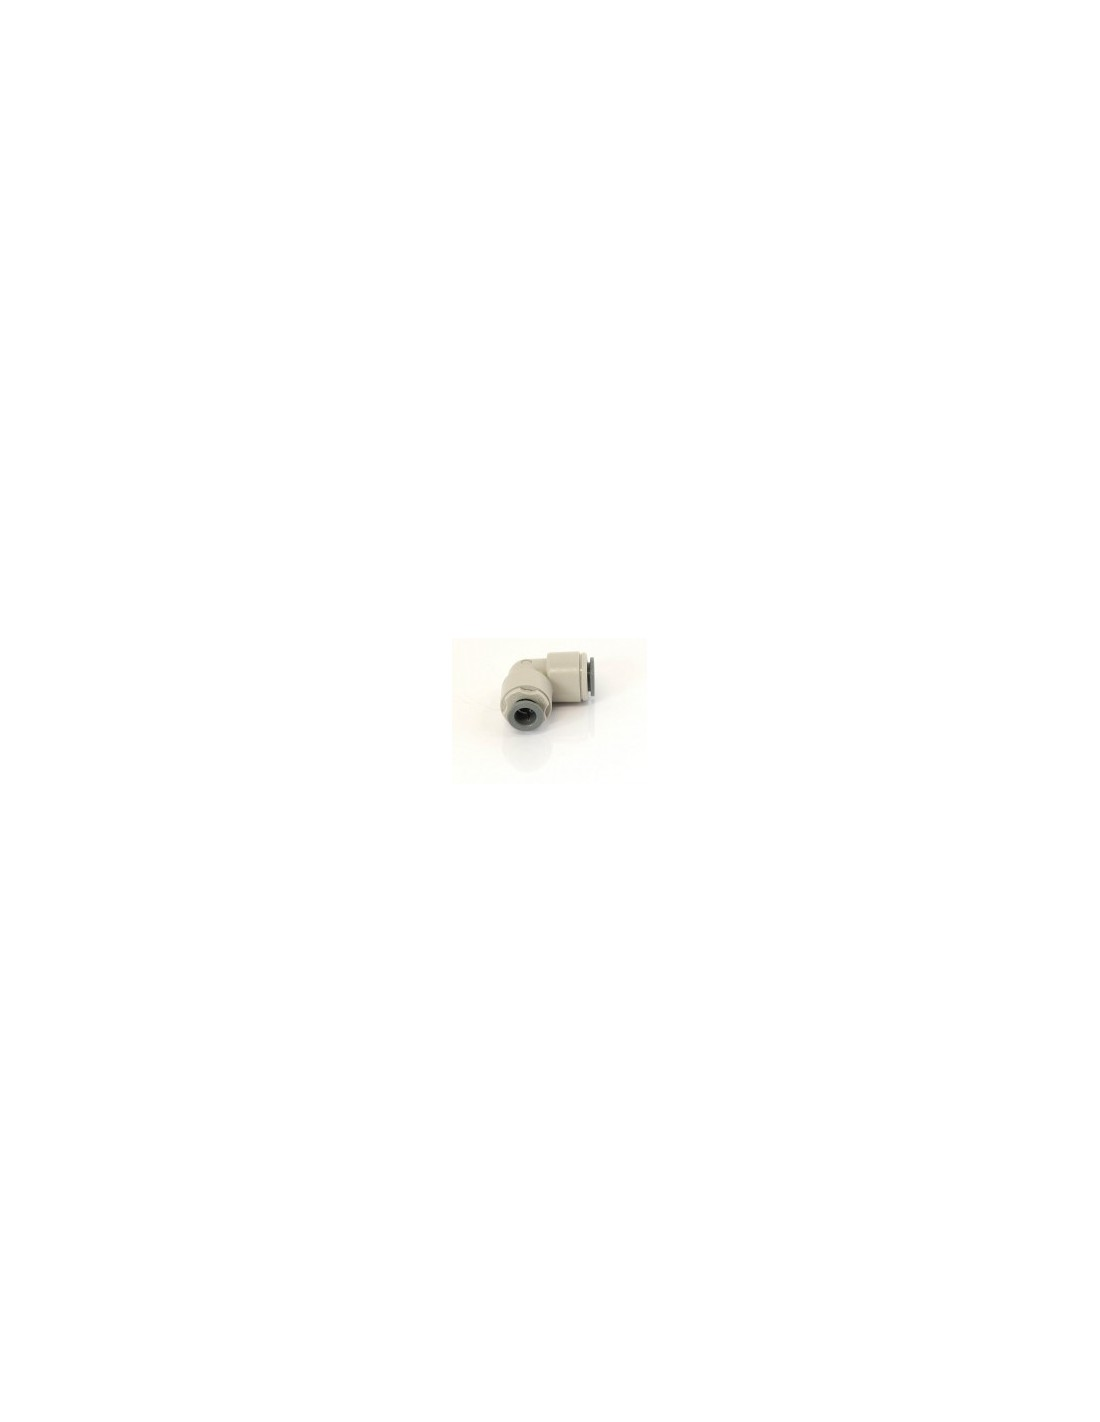 "SPO00117 - JG SS elbow reducer 9.5 x 8 mm (3/8"" x 5/16"") (SI031012S)"